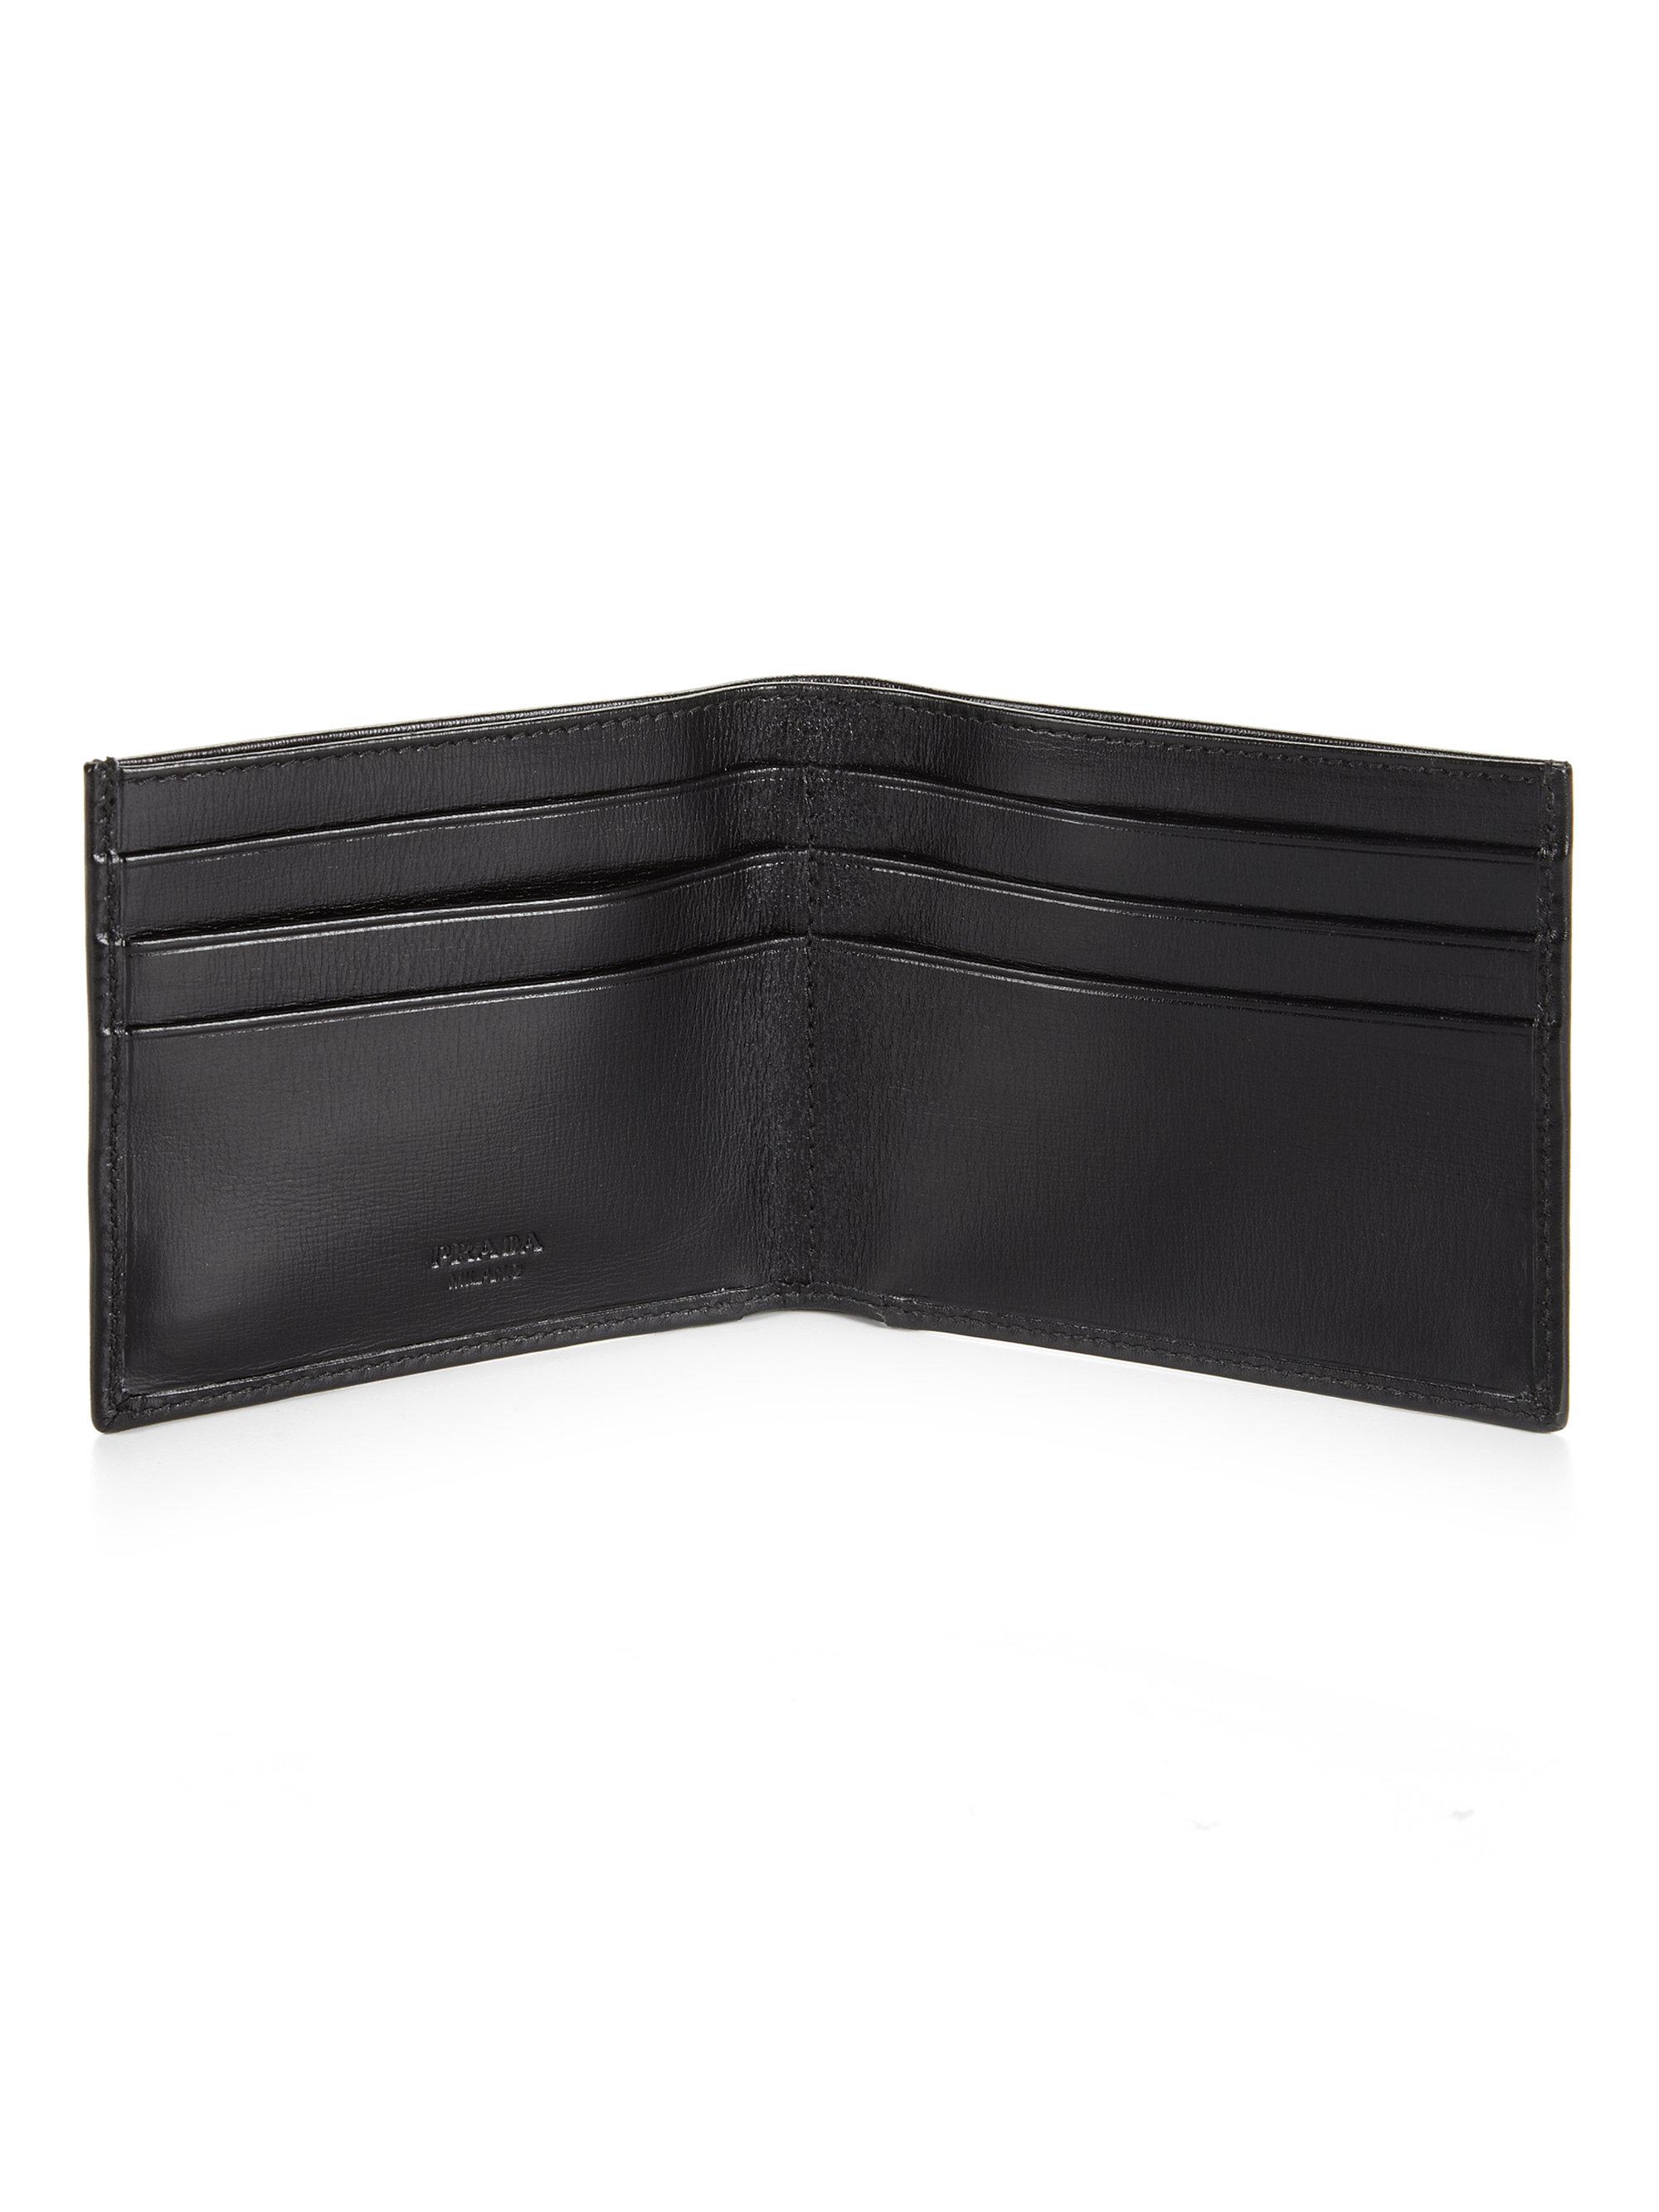 handbags popular - prada calf skin wallet